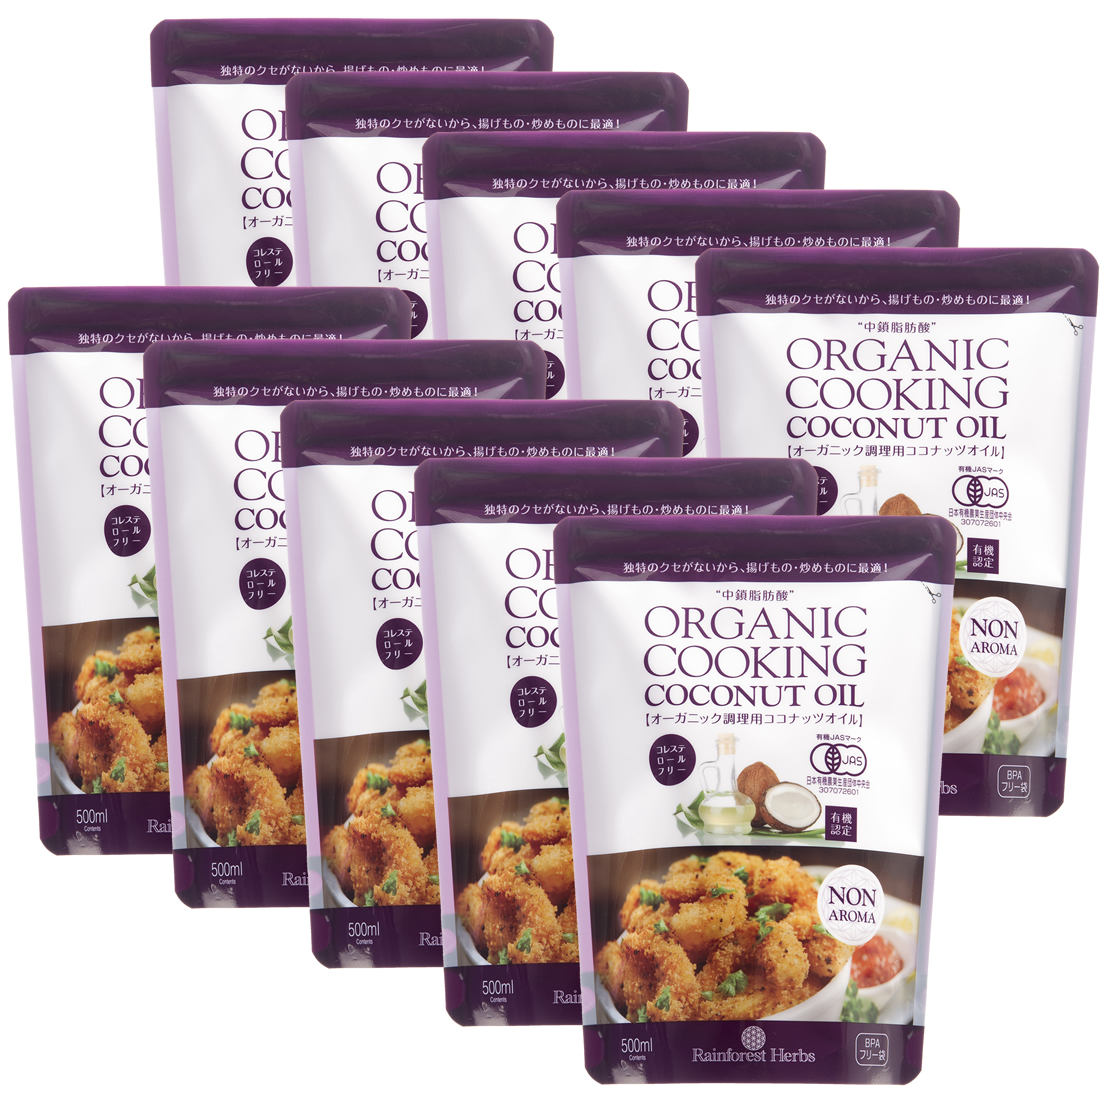 JASオーガニック認定 有機調理用 ココナッツオイル 500ml(456g)10個セット organic cooking coconut oil (有機認定食品 中鎖脂肪酸 コレステロールフリー NON AROMA)日本の工場で袋詰 noBPA